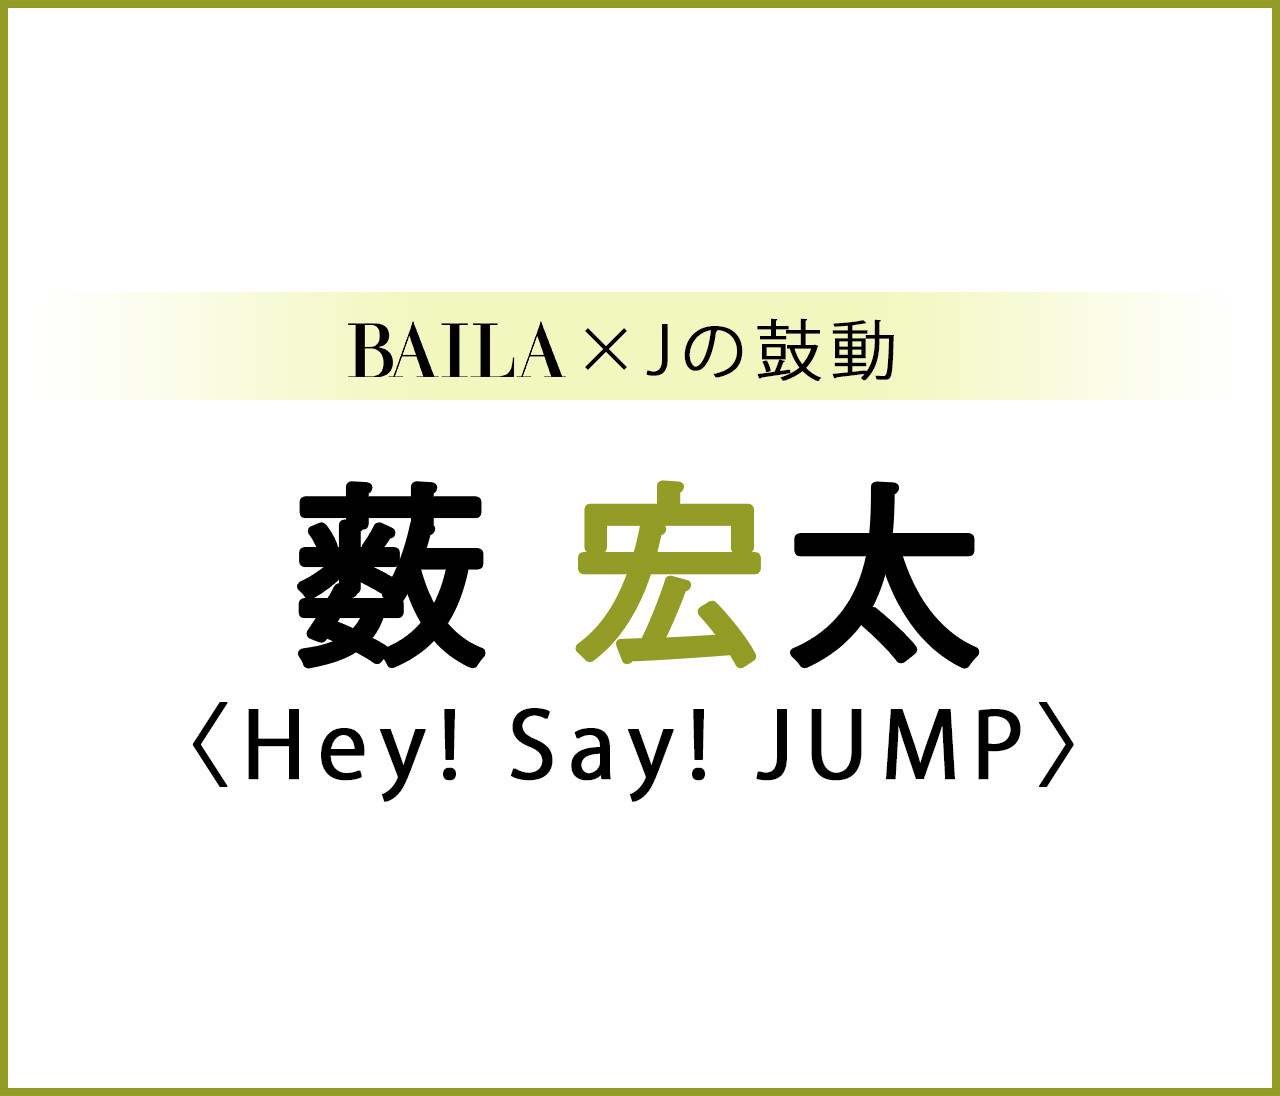 【 #HeySayJUMP #薮宏太 】Hey! Say! JUMP 薮宏太スペシャルインタビュー!【BAILA × Jの鼓動】